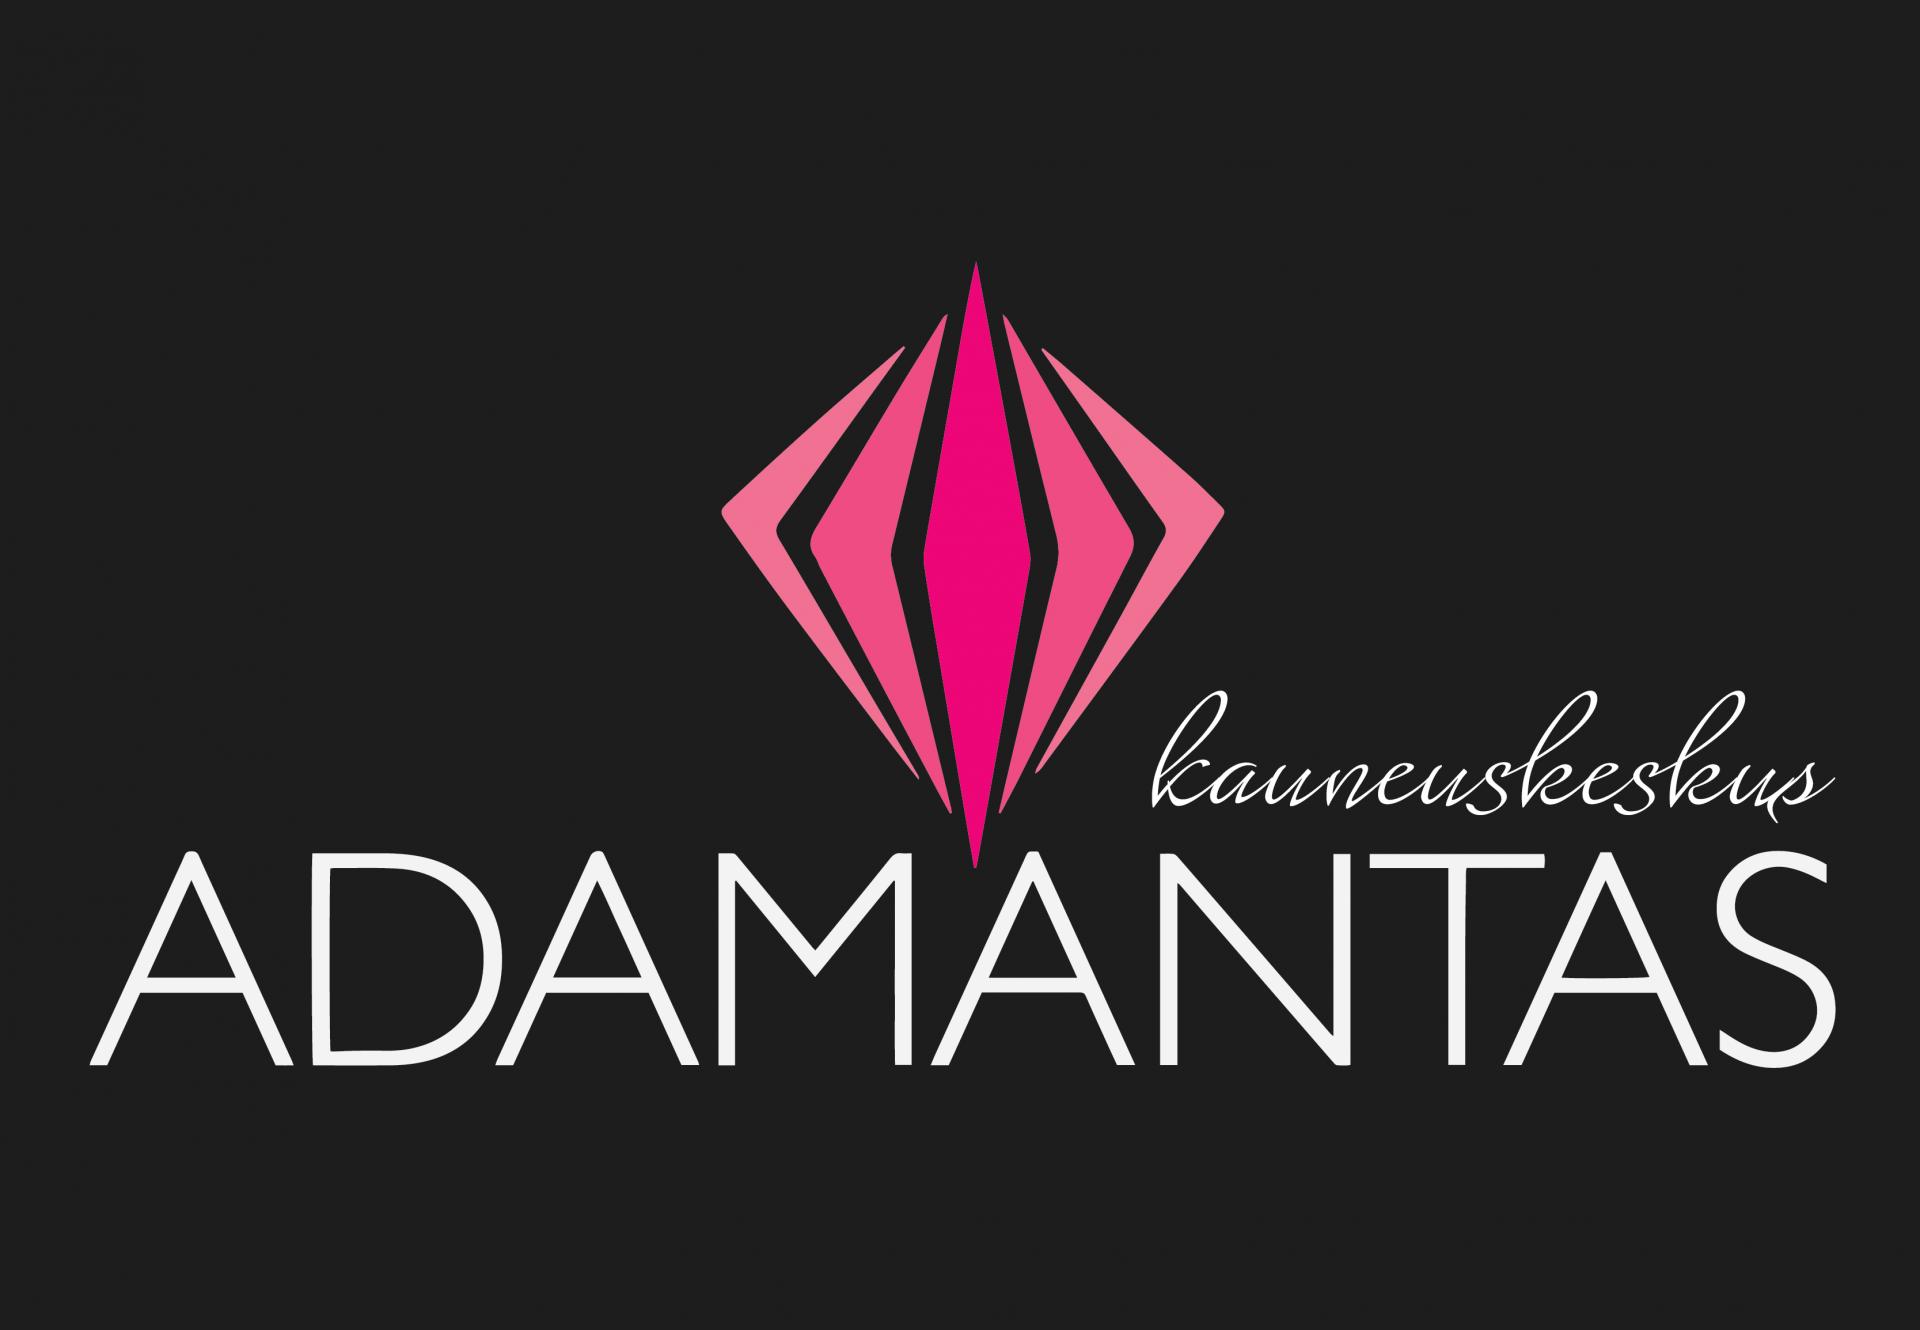 adamantas_logo_taustalla